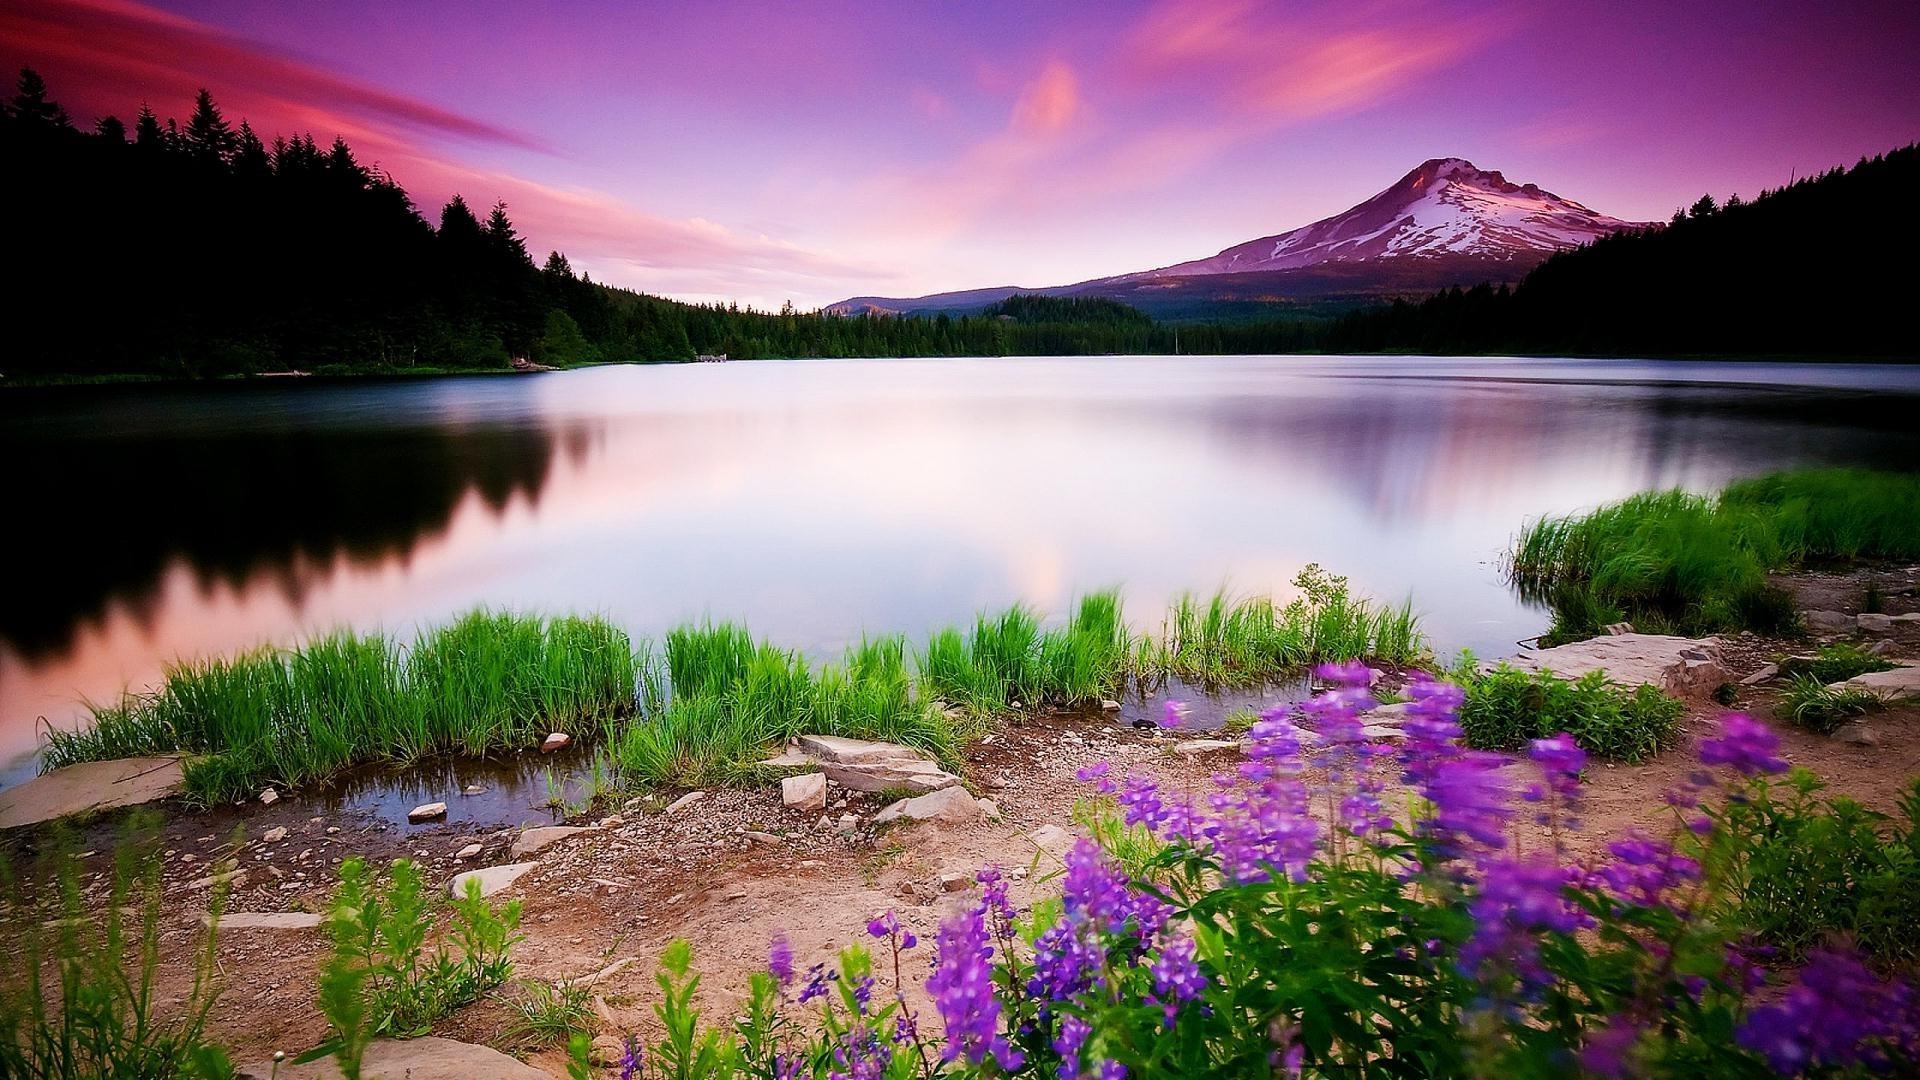 love wallpaper hd 1080p free download,natural landscape,nature,lake,sky,reflection